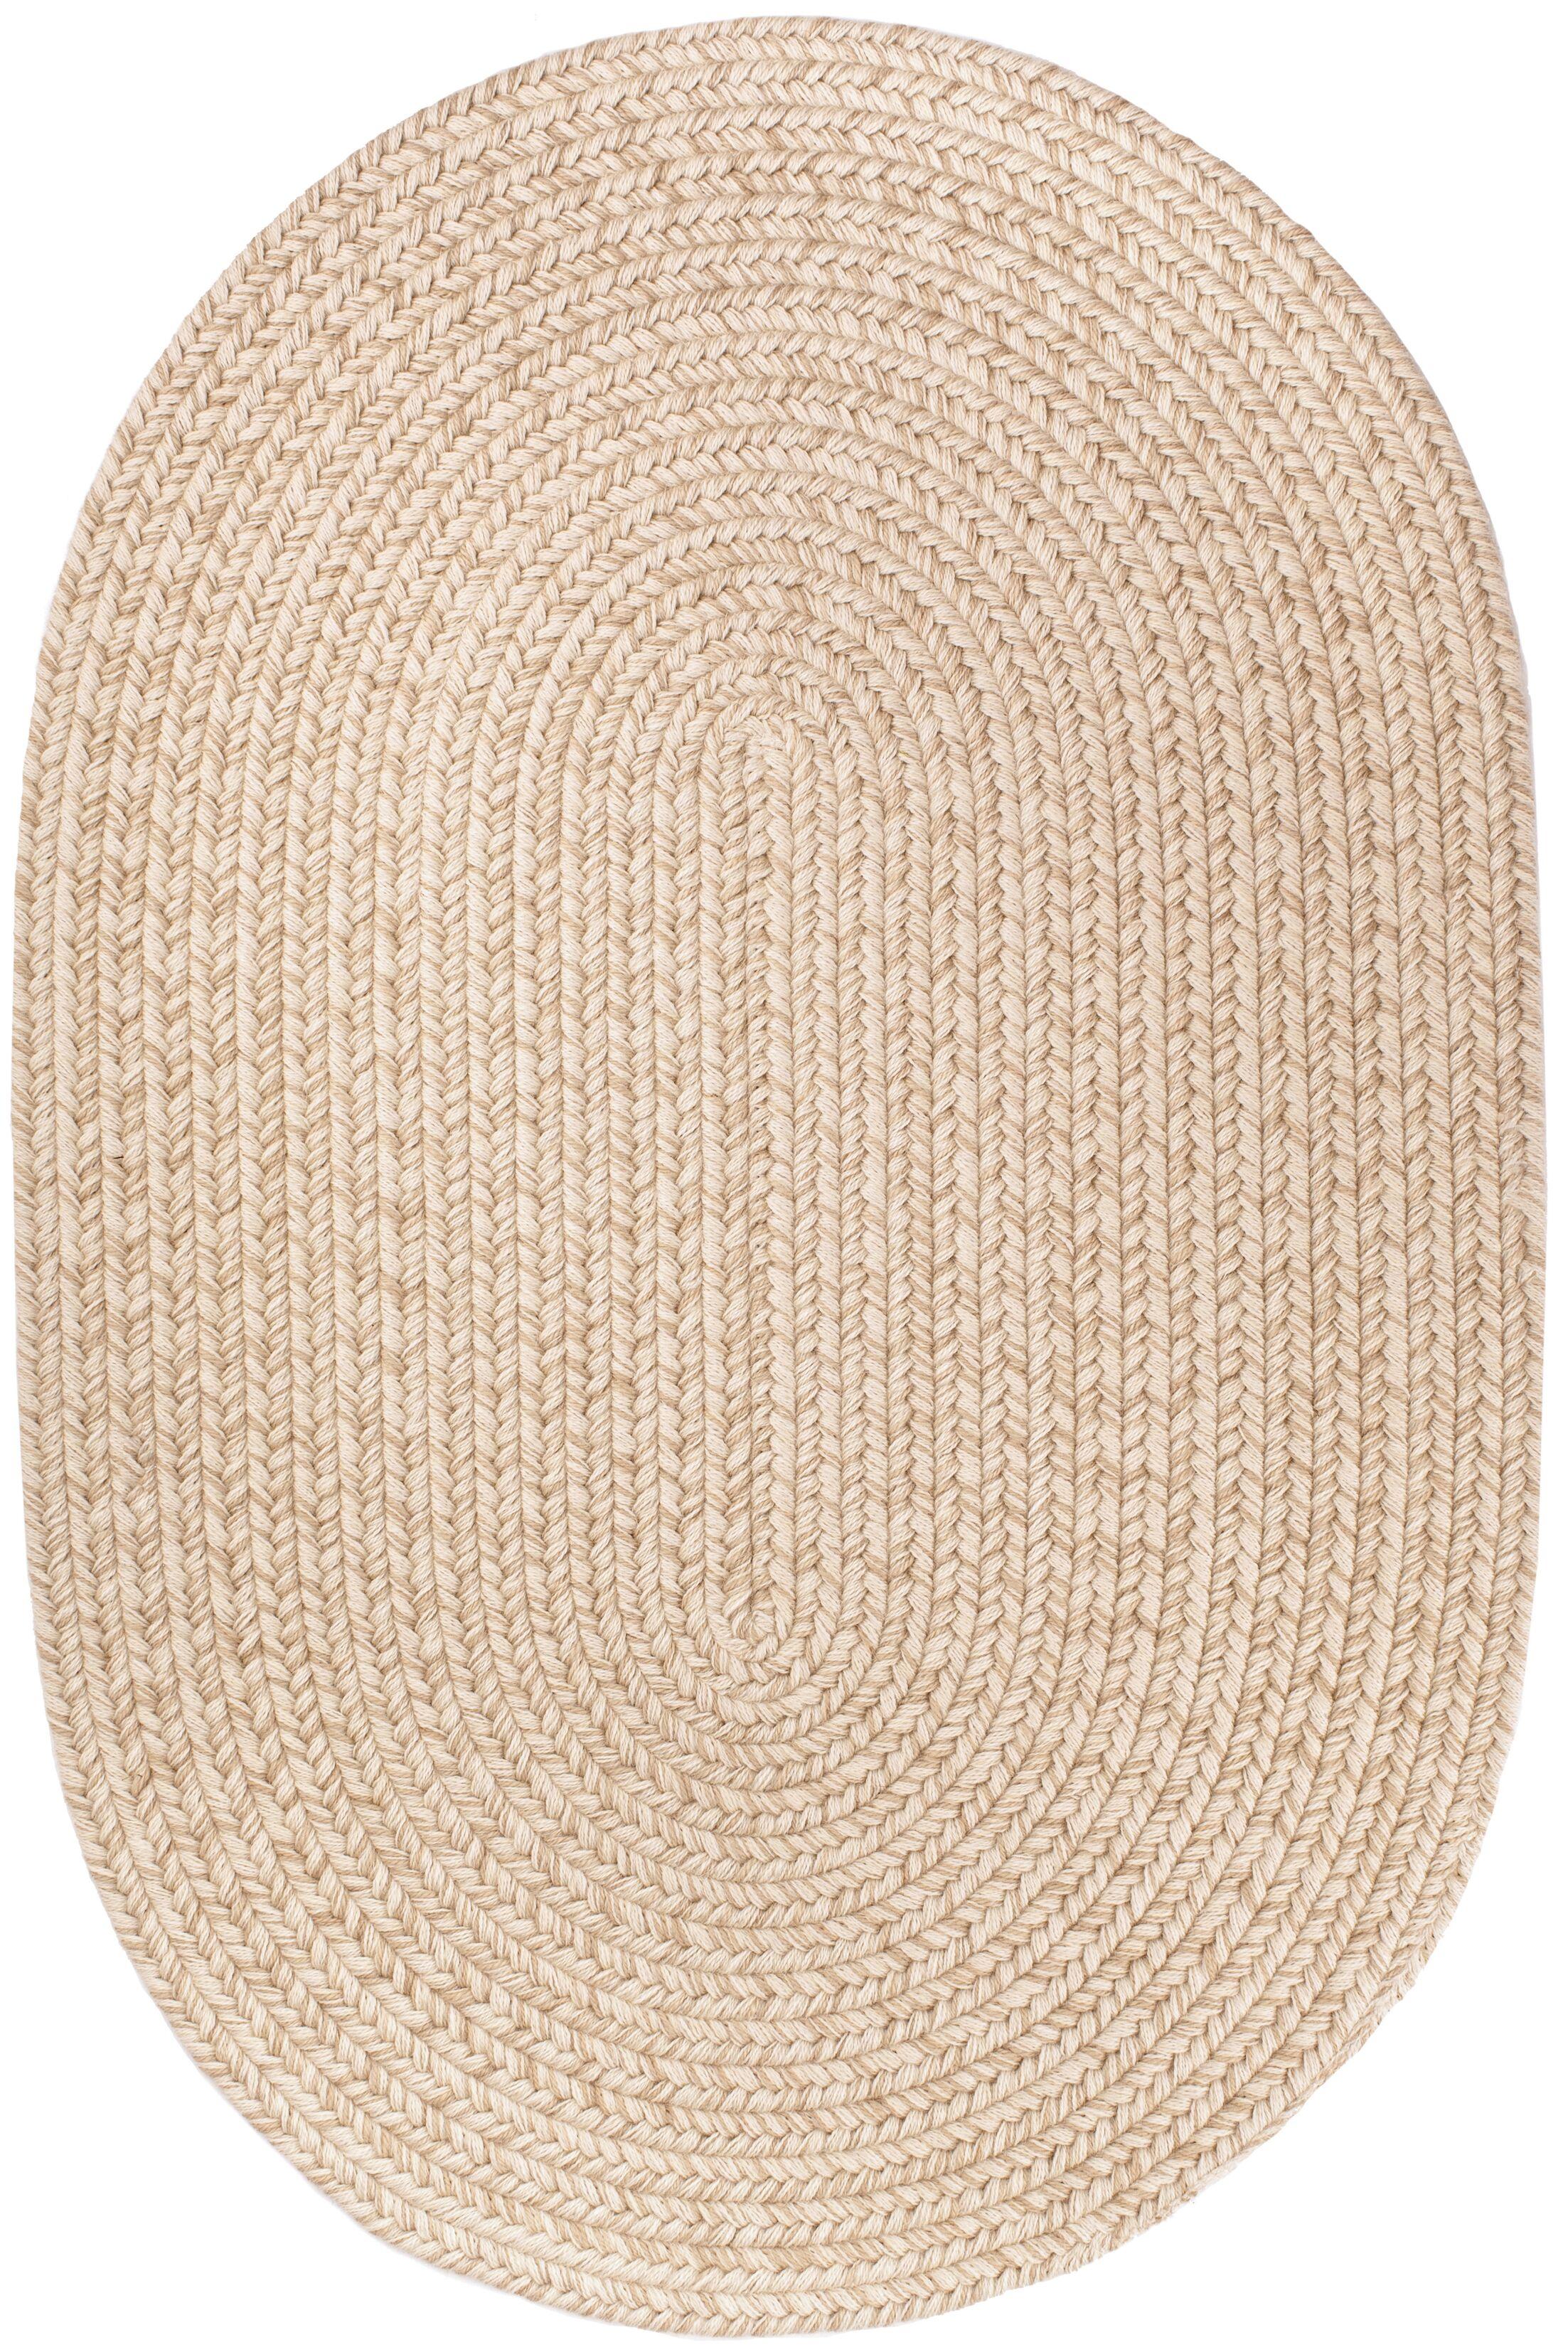 Handmade Sand Area Rug Rug Size: Oval  7' x 9'